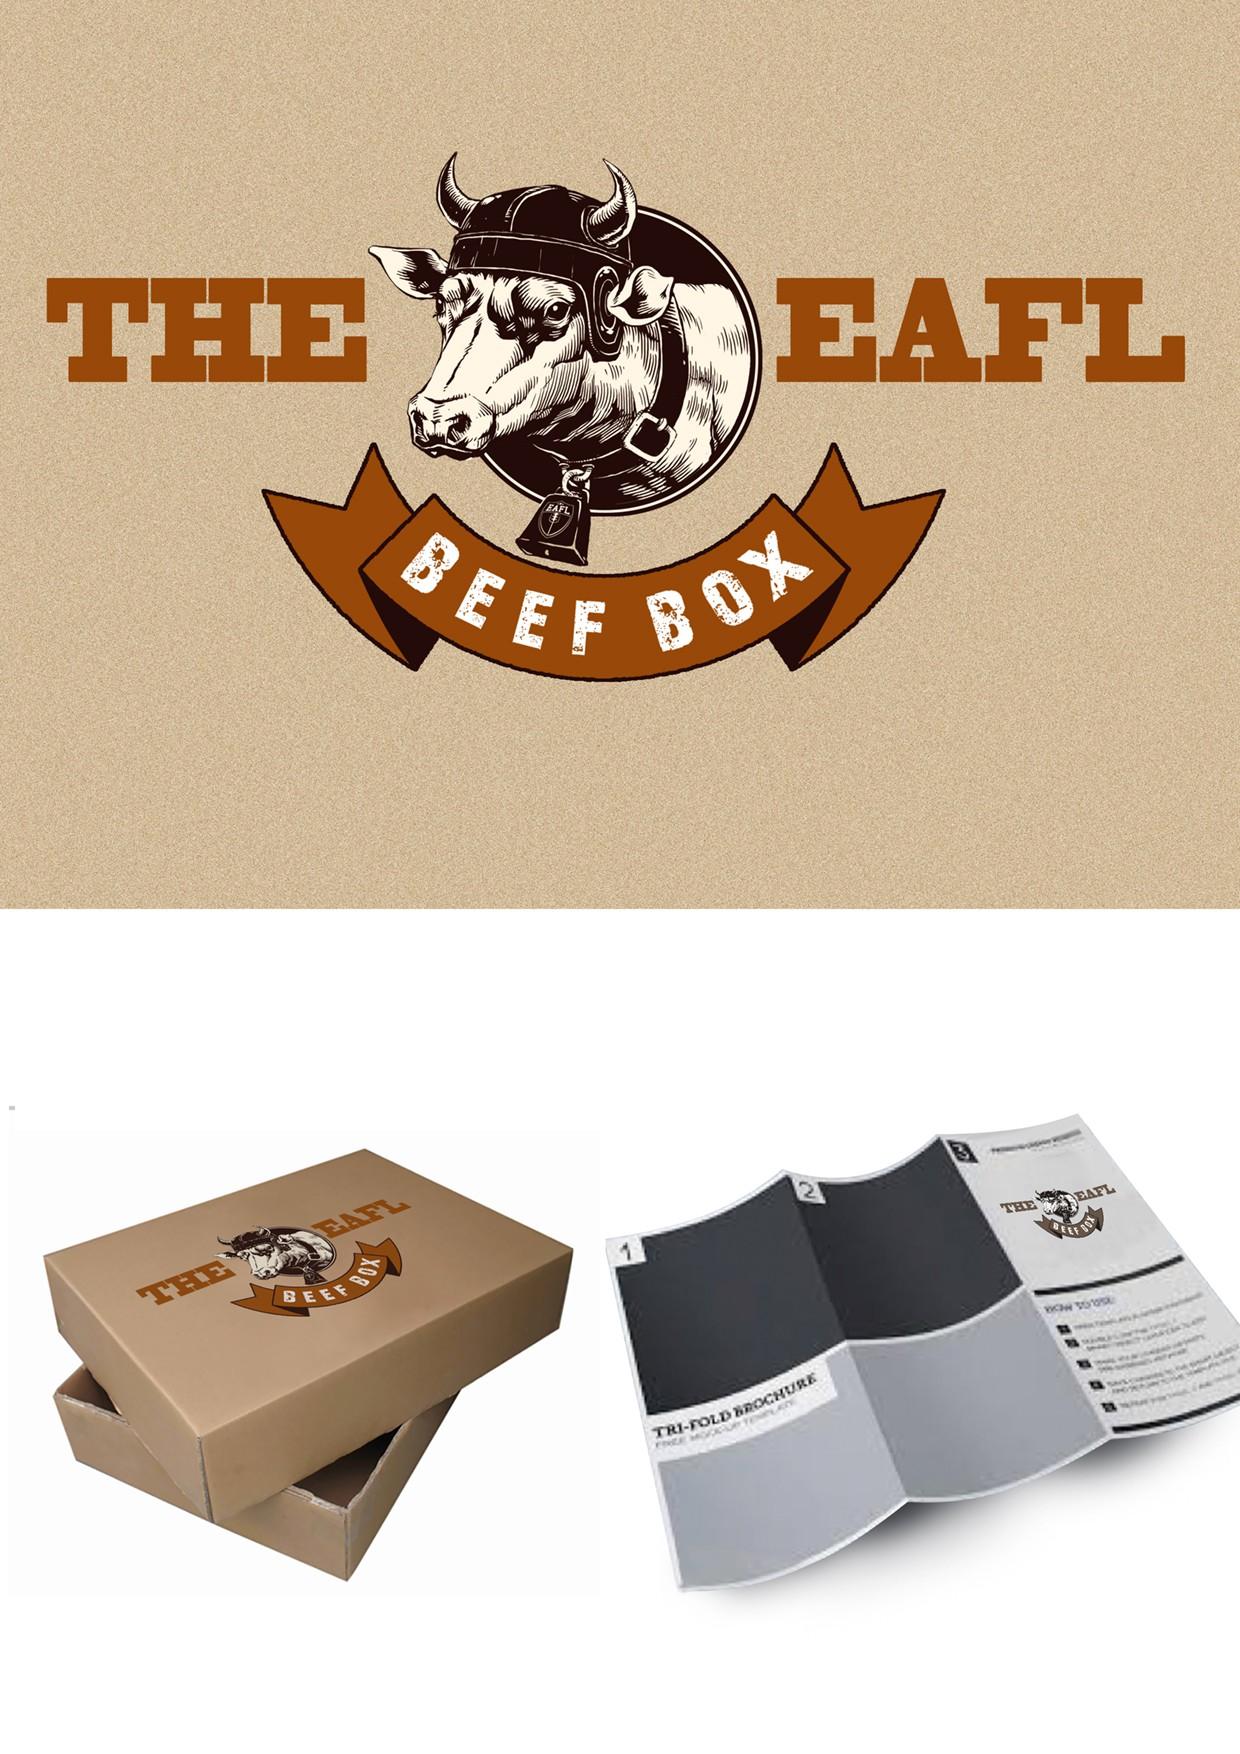 BEEF BOX Fundraiser Illustration / Image